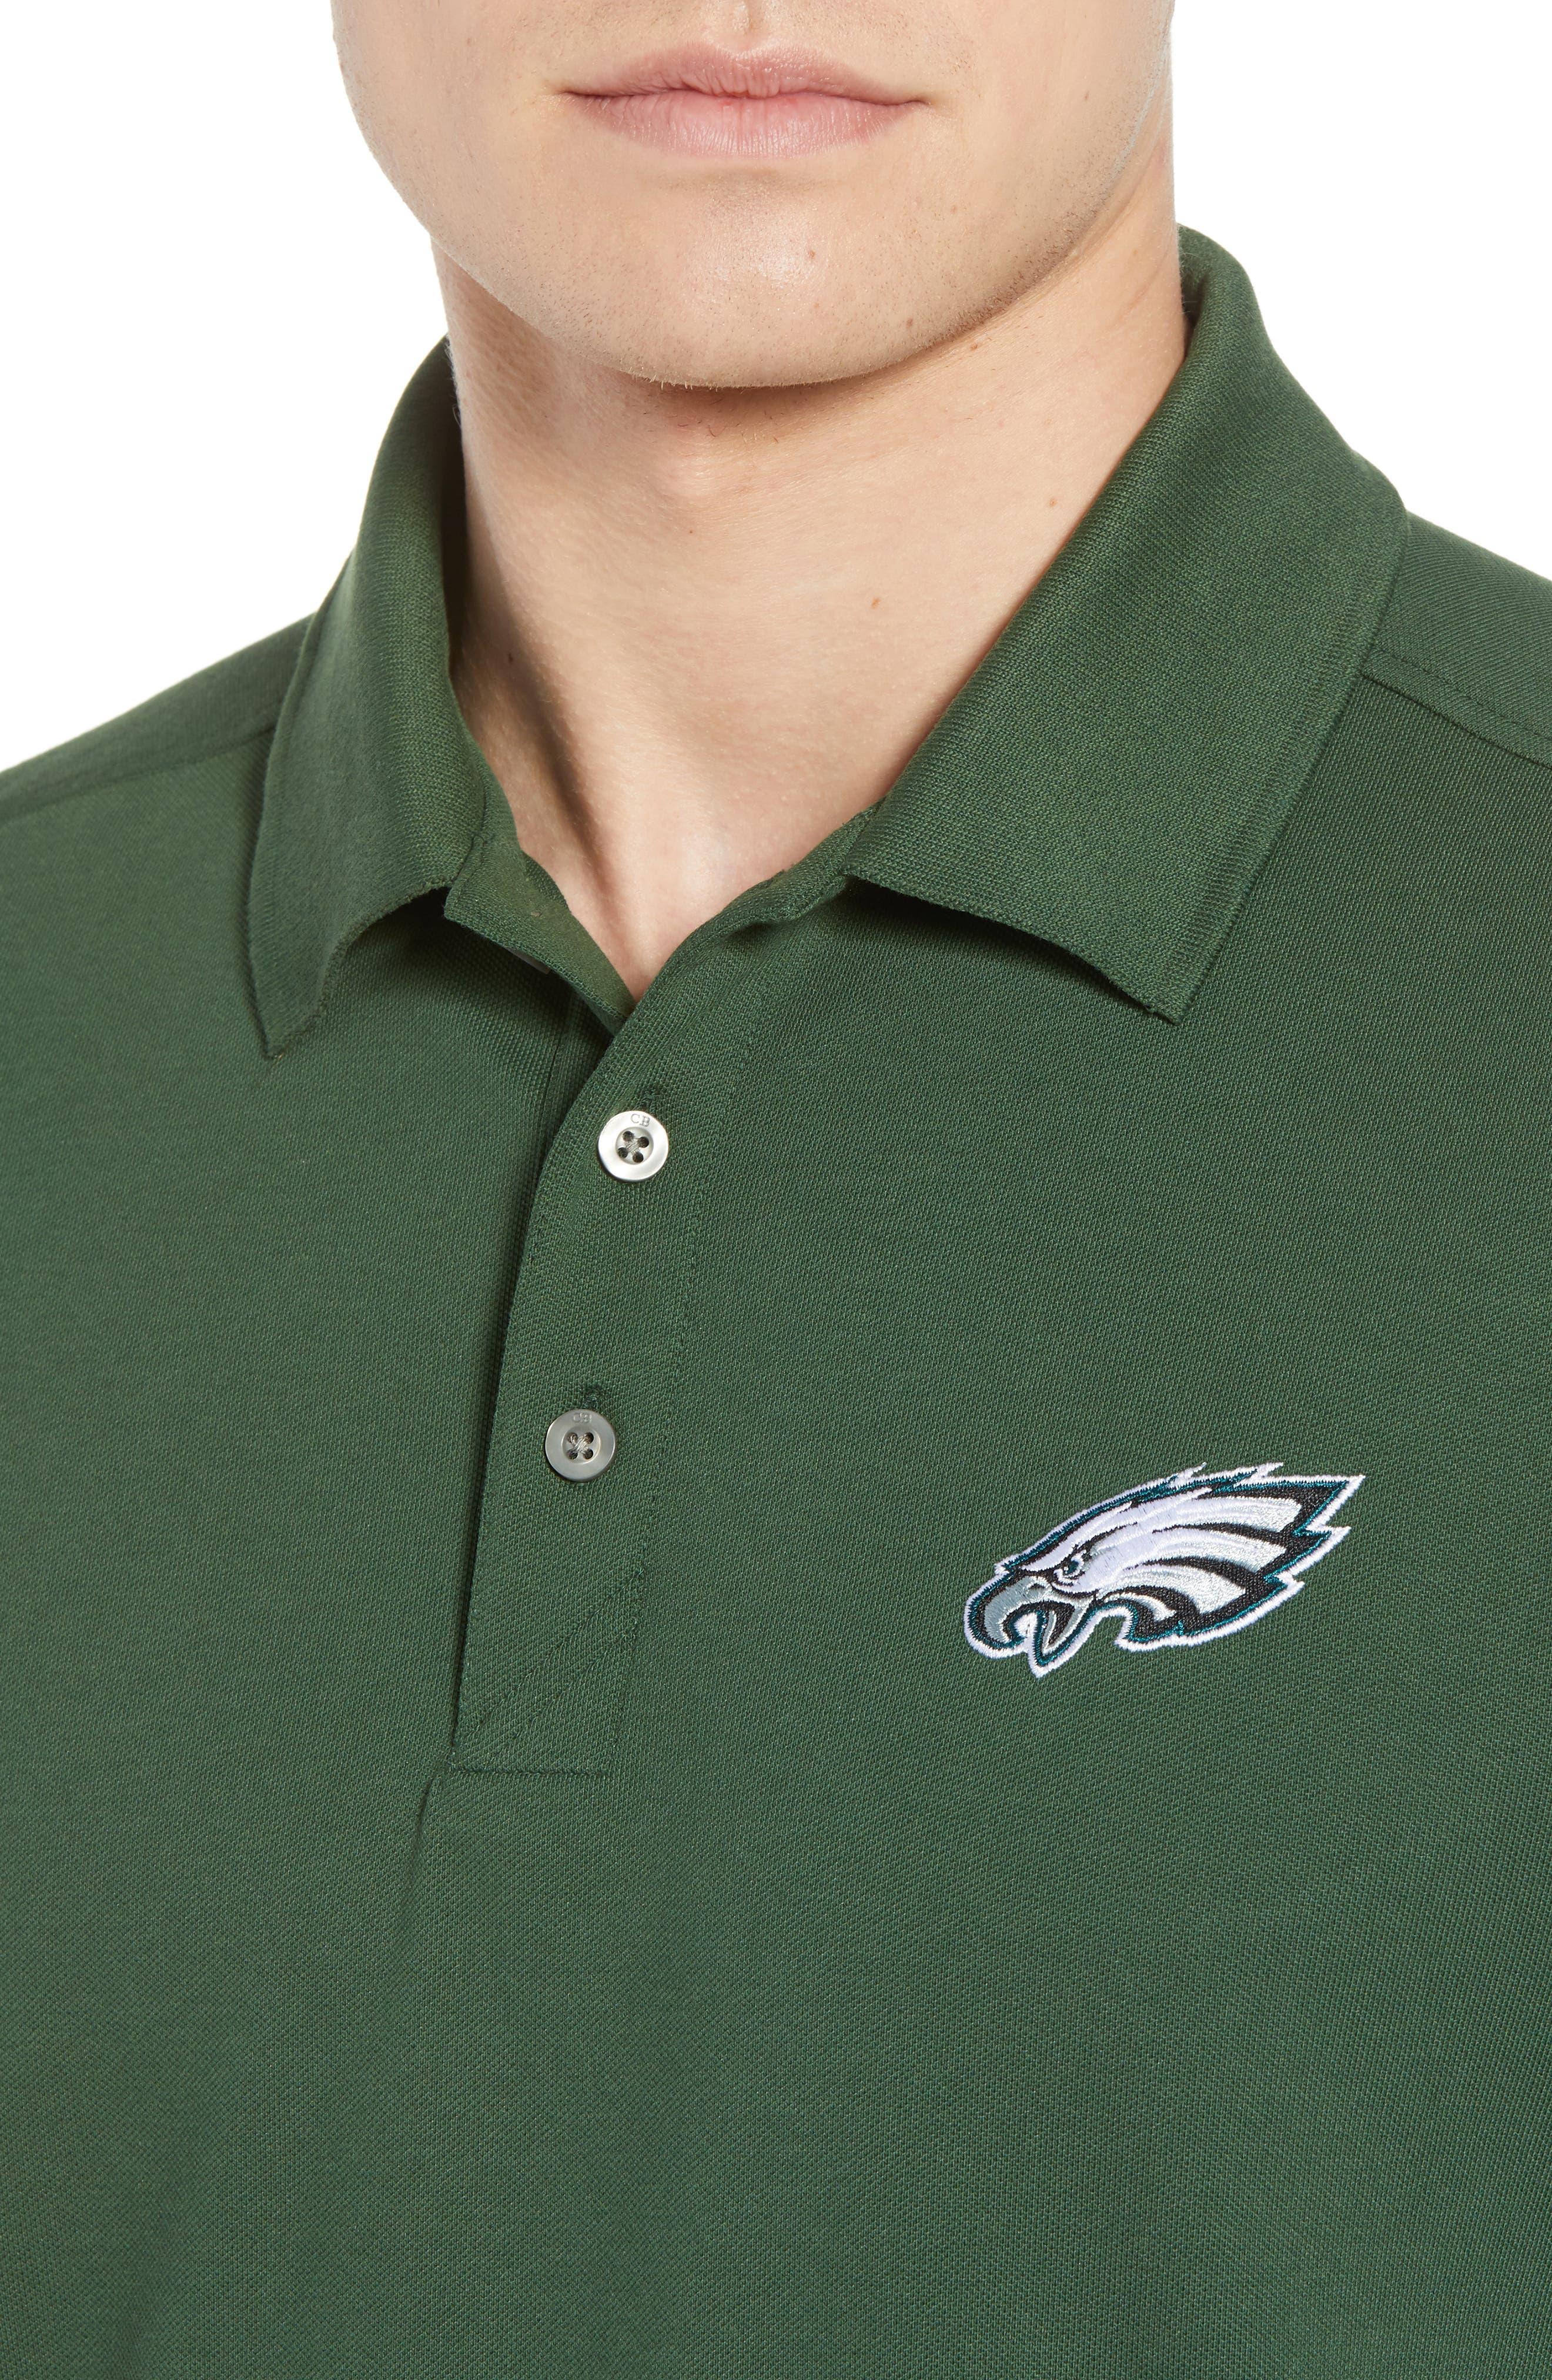 Philadelphia Eagles - Advantage Regular Fit DryTec Polo,                             Alternate thumbnail 4, color,                             HUNTER GREEN